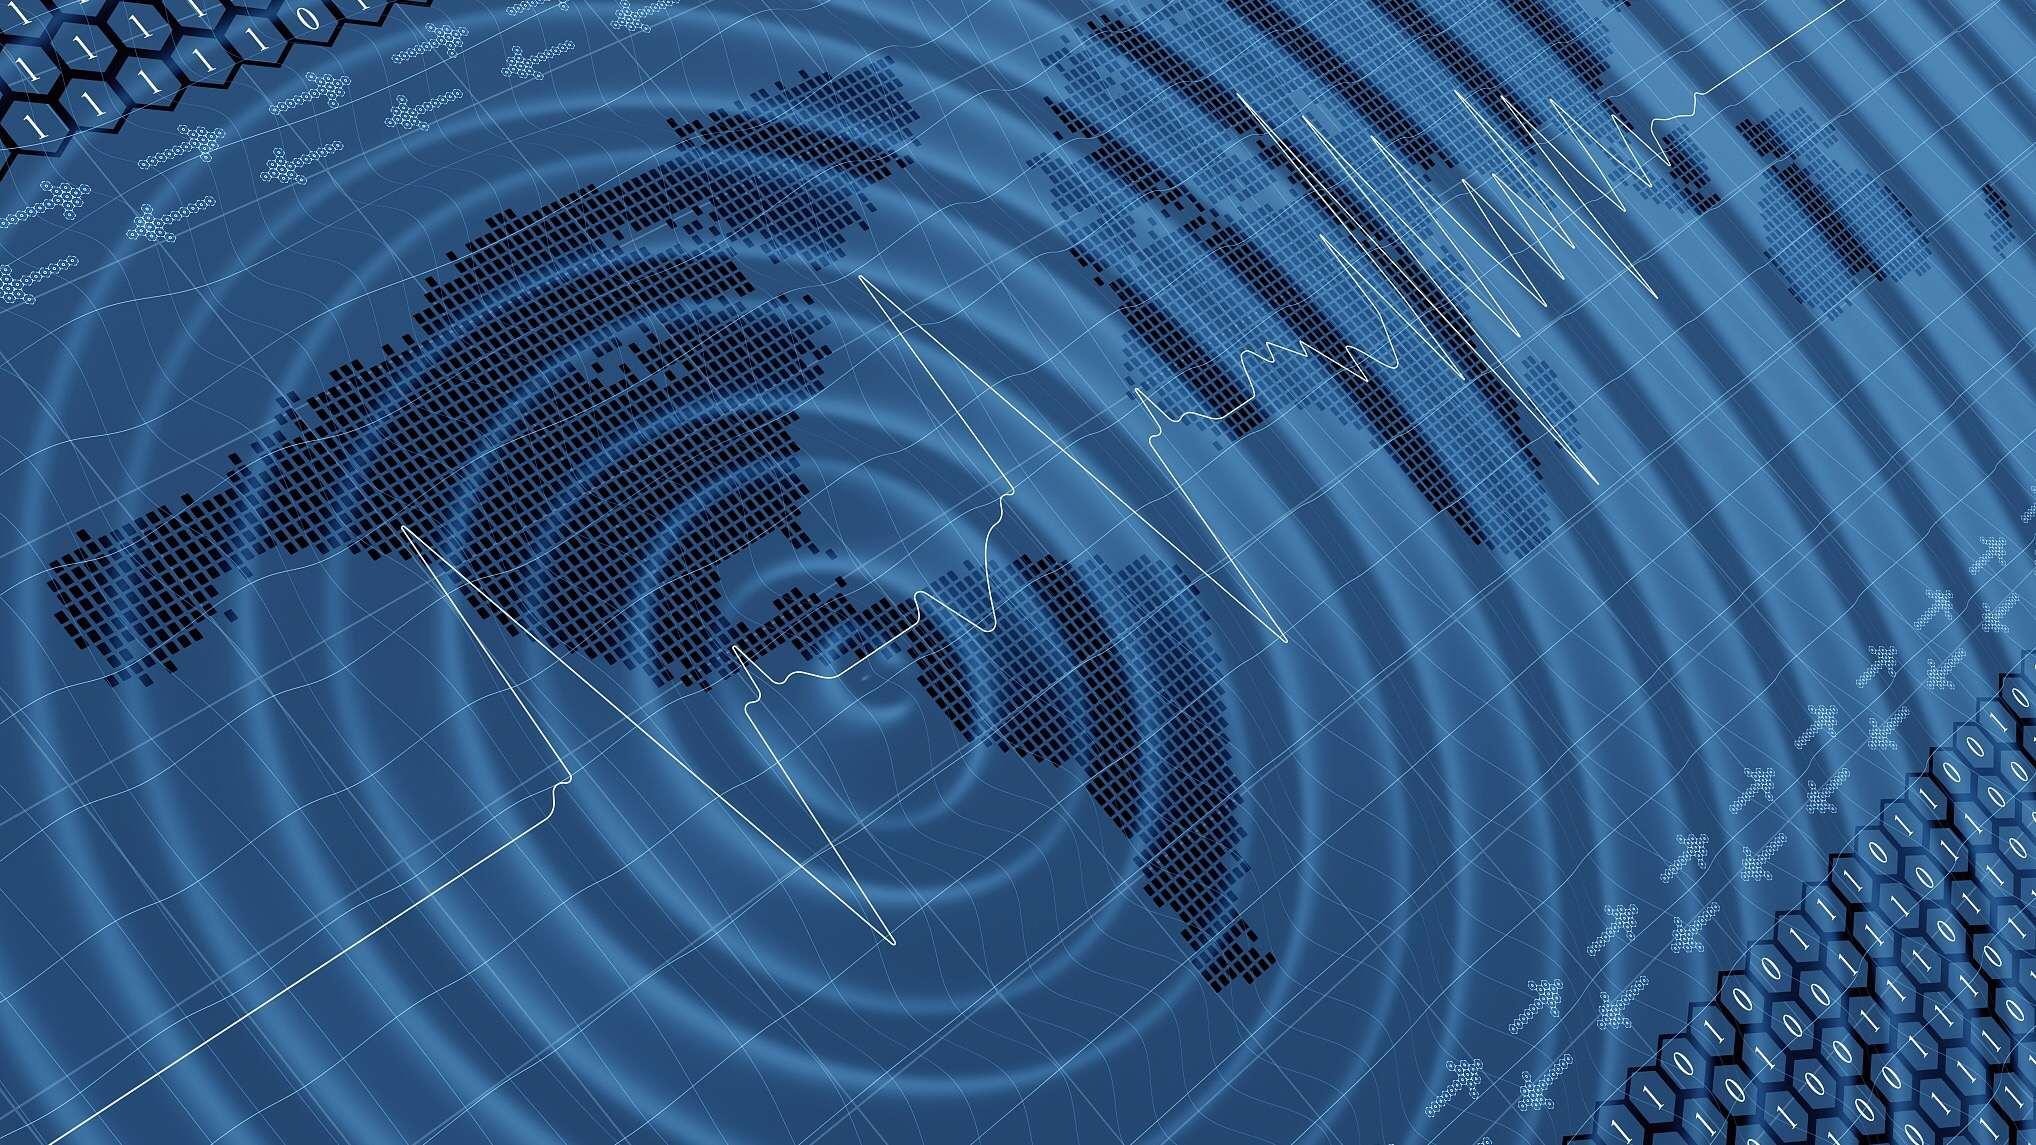 6.0-magnitude quake hits 14km SE of Guanica, Puerto Rico -- USGS